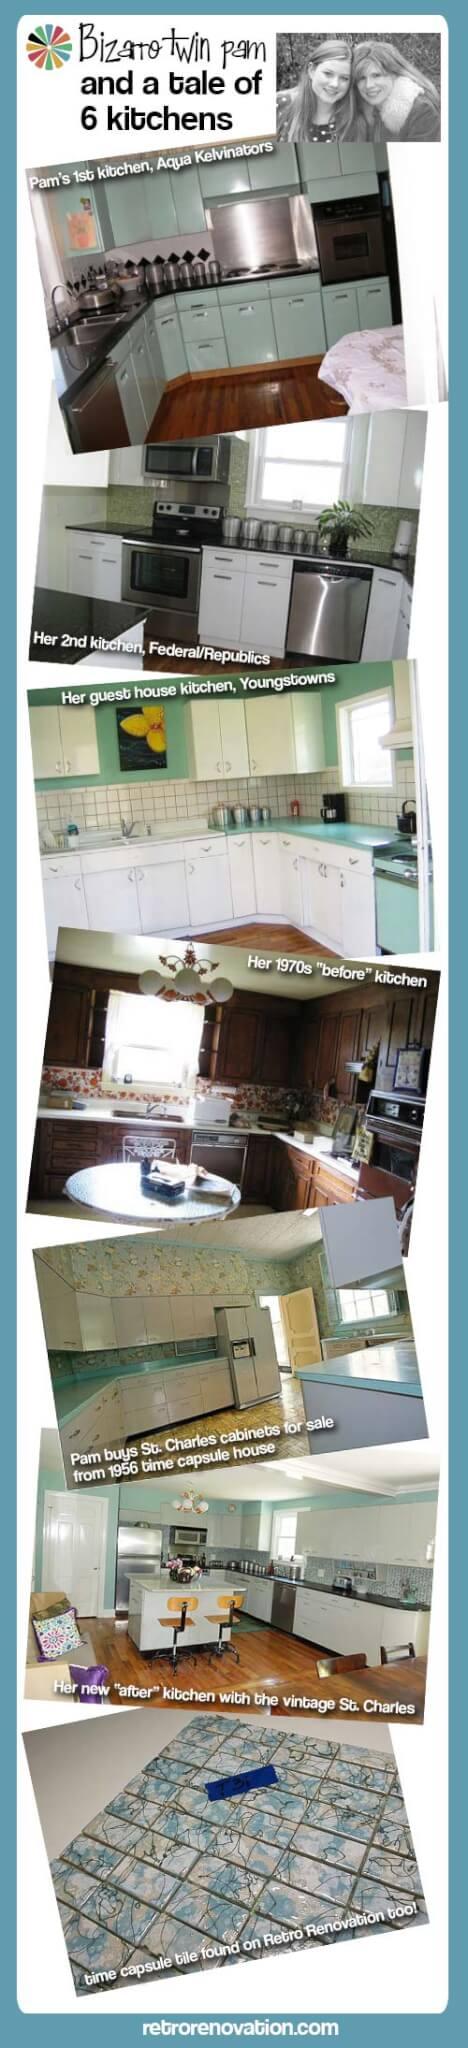 six kitchen renovations